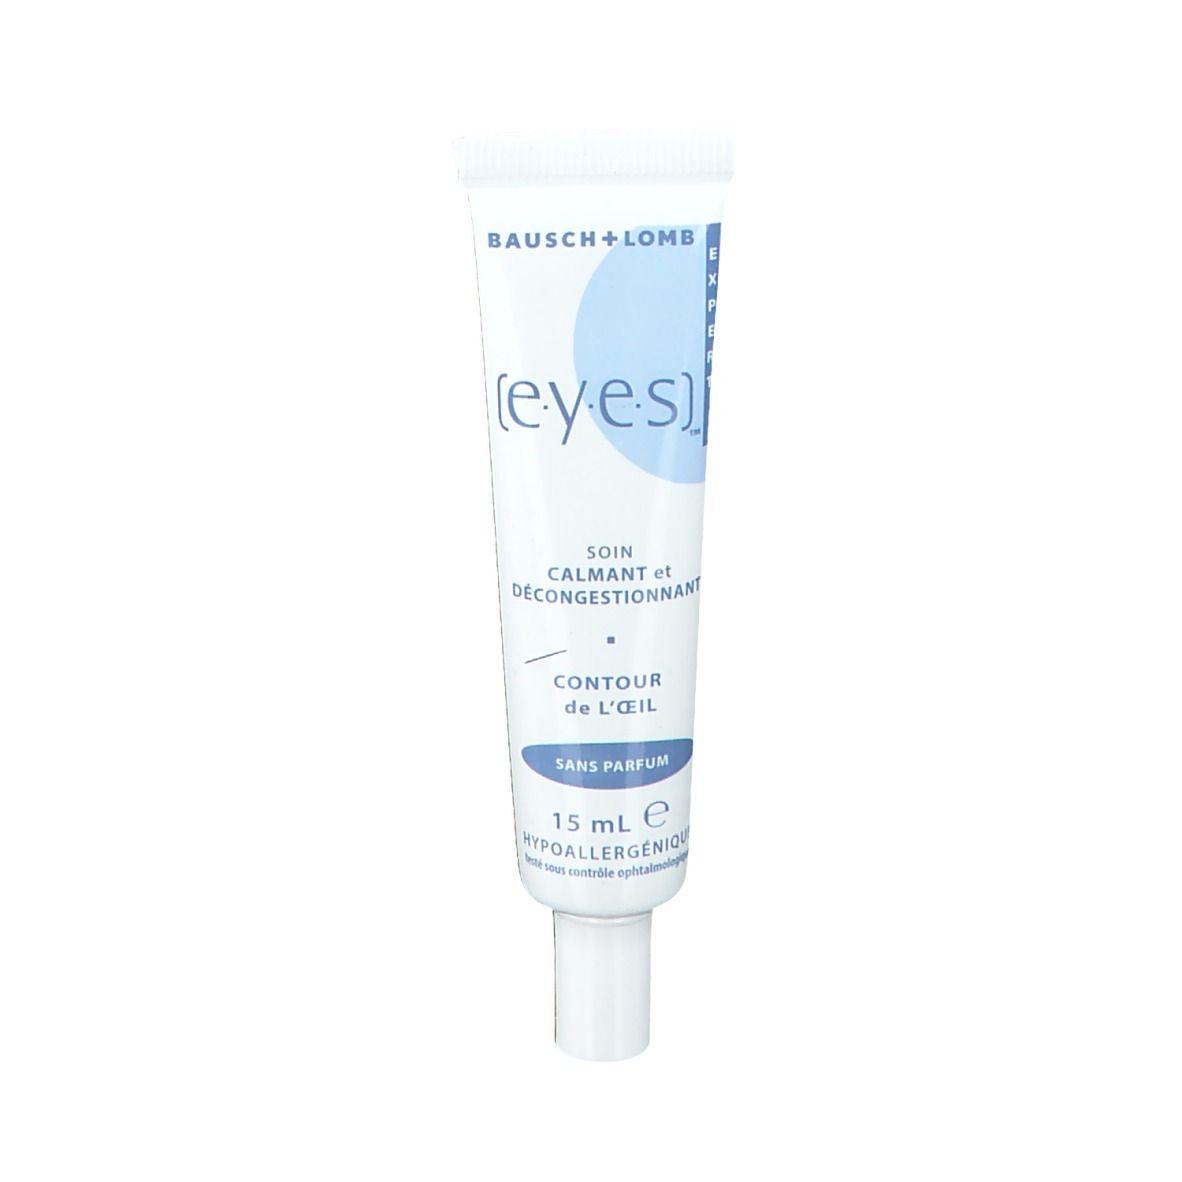 Image of Augen-Experte beruhigende abschwellende Augenkontur-Behandlung